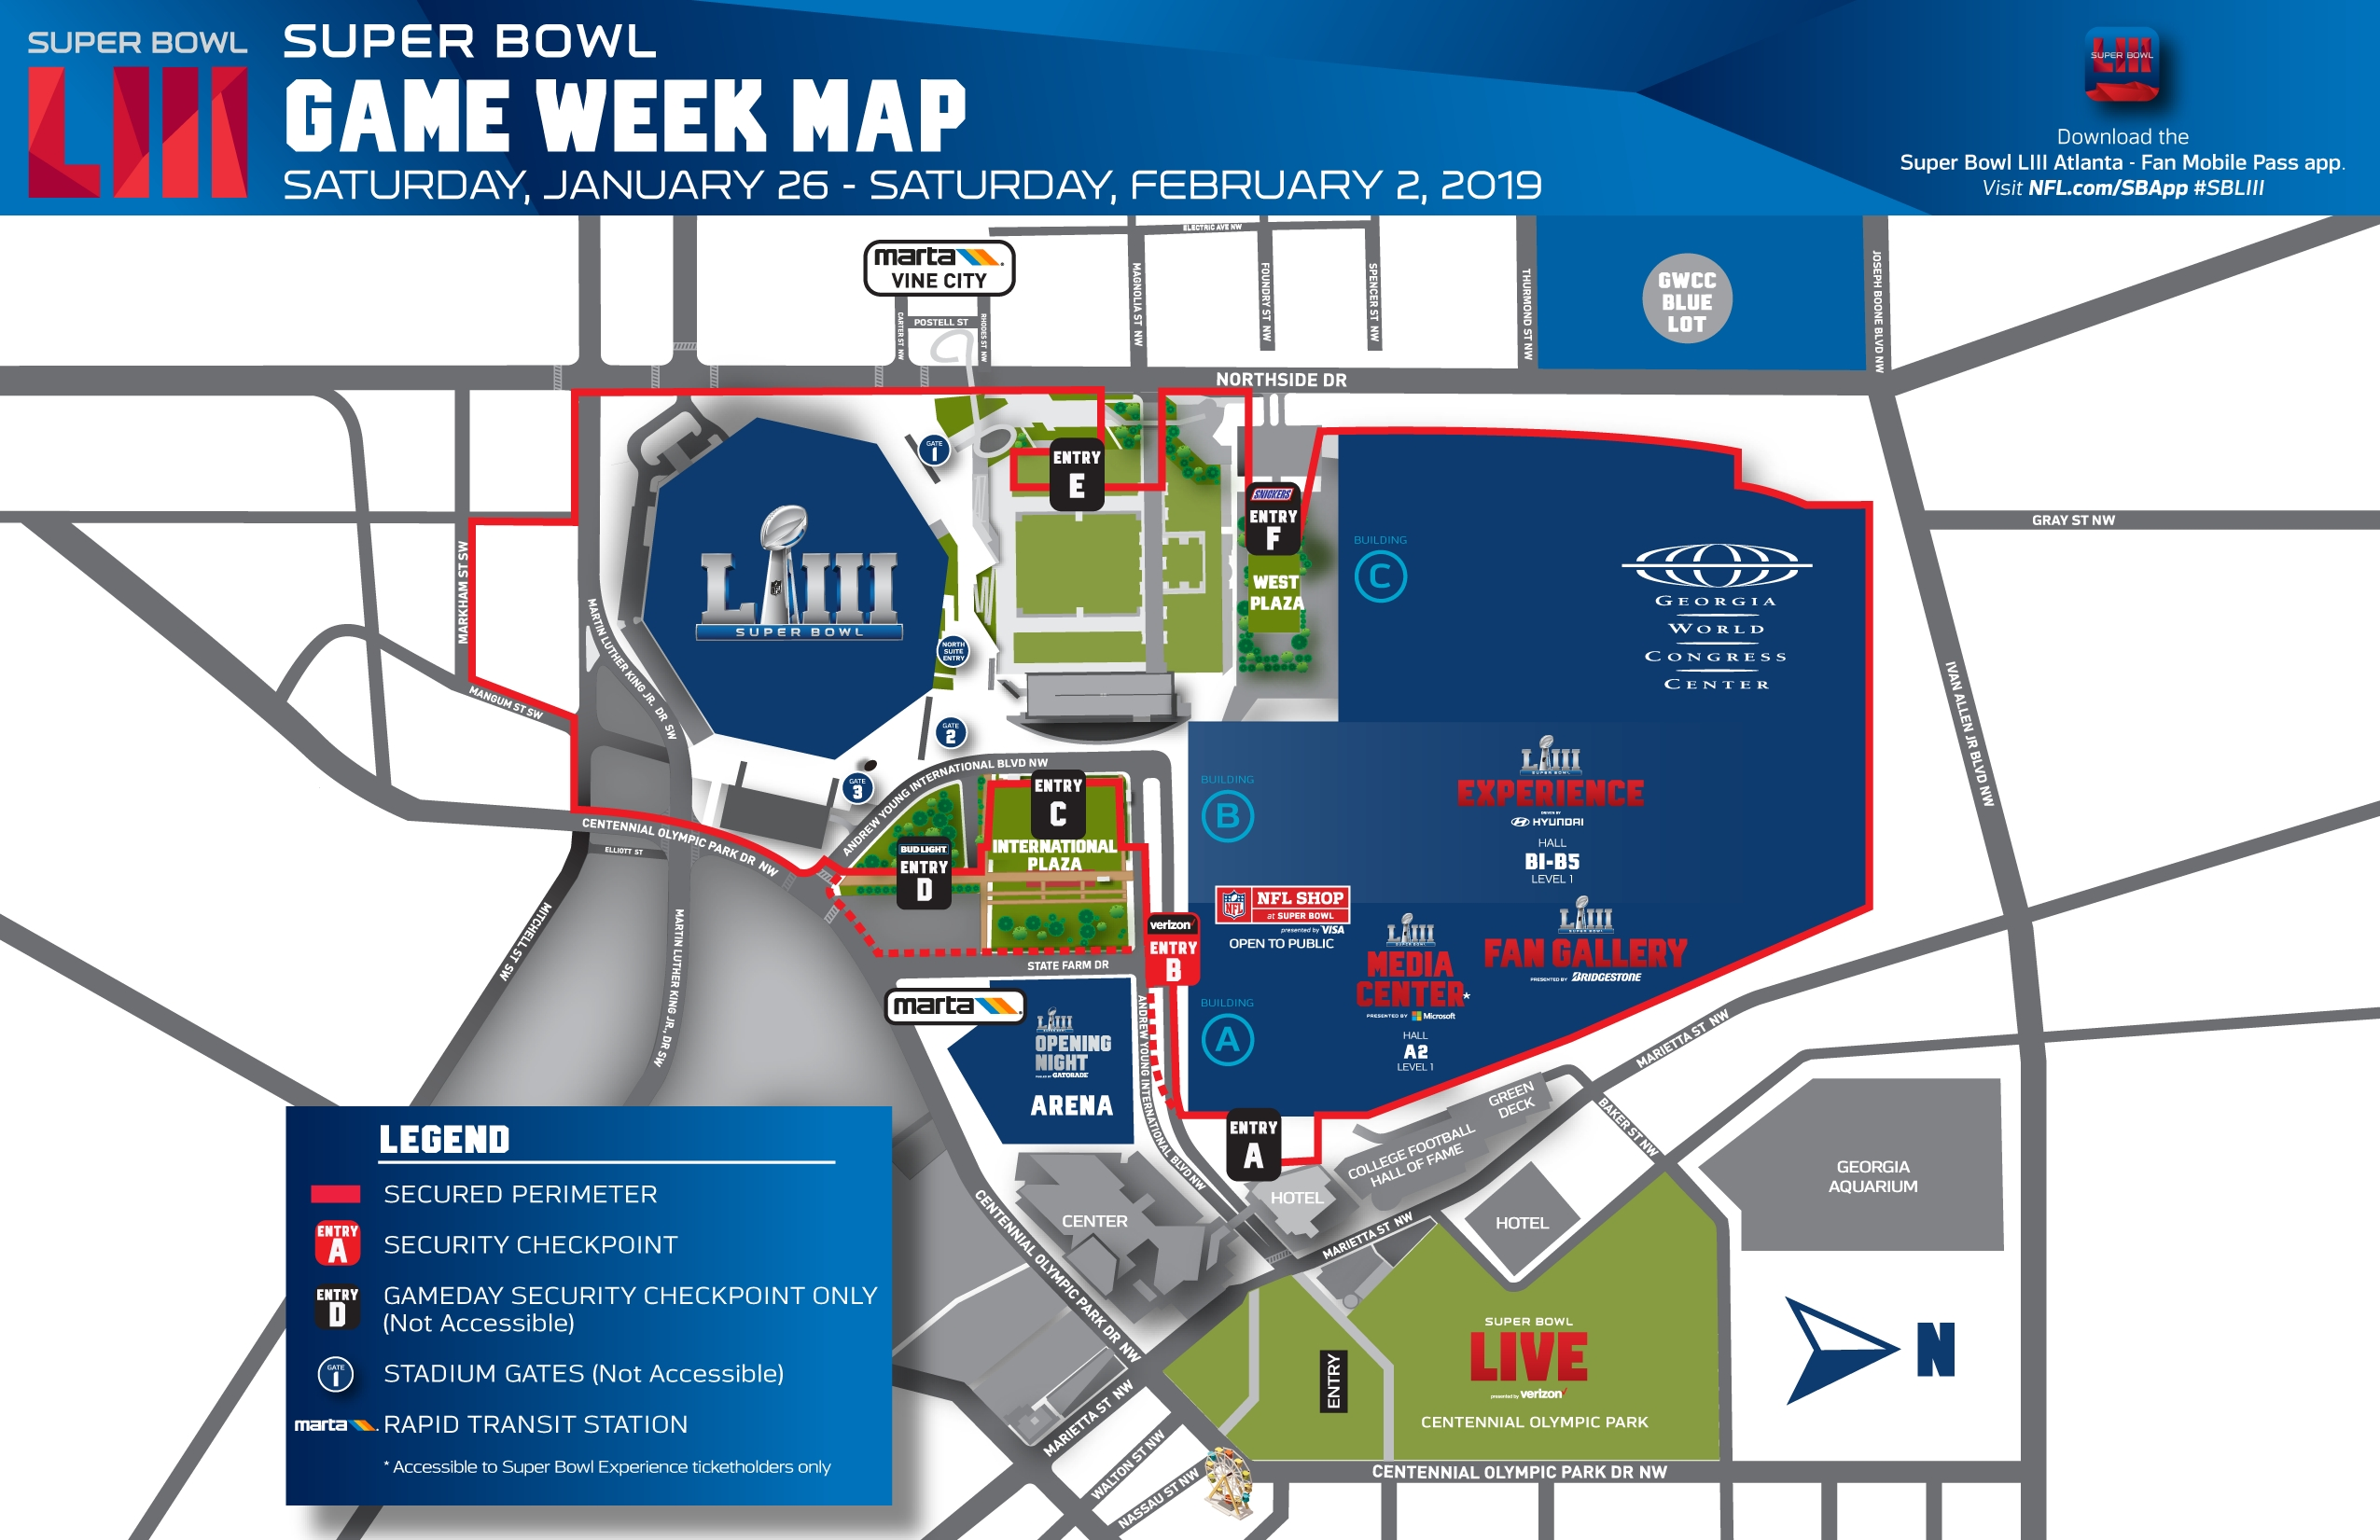 Super Bowl Hub - Mercedes Benz Stadium throughout Super Bowl Liii Seating Chart